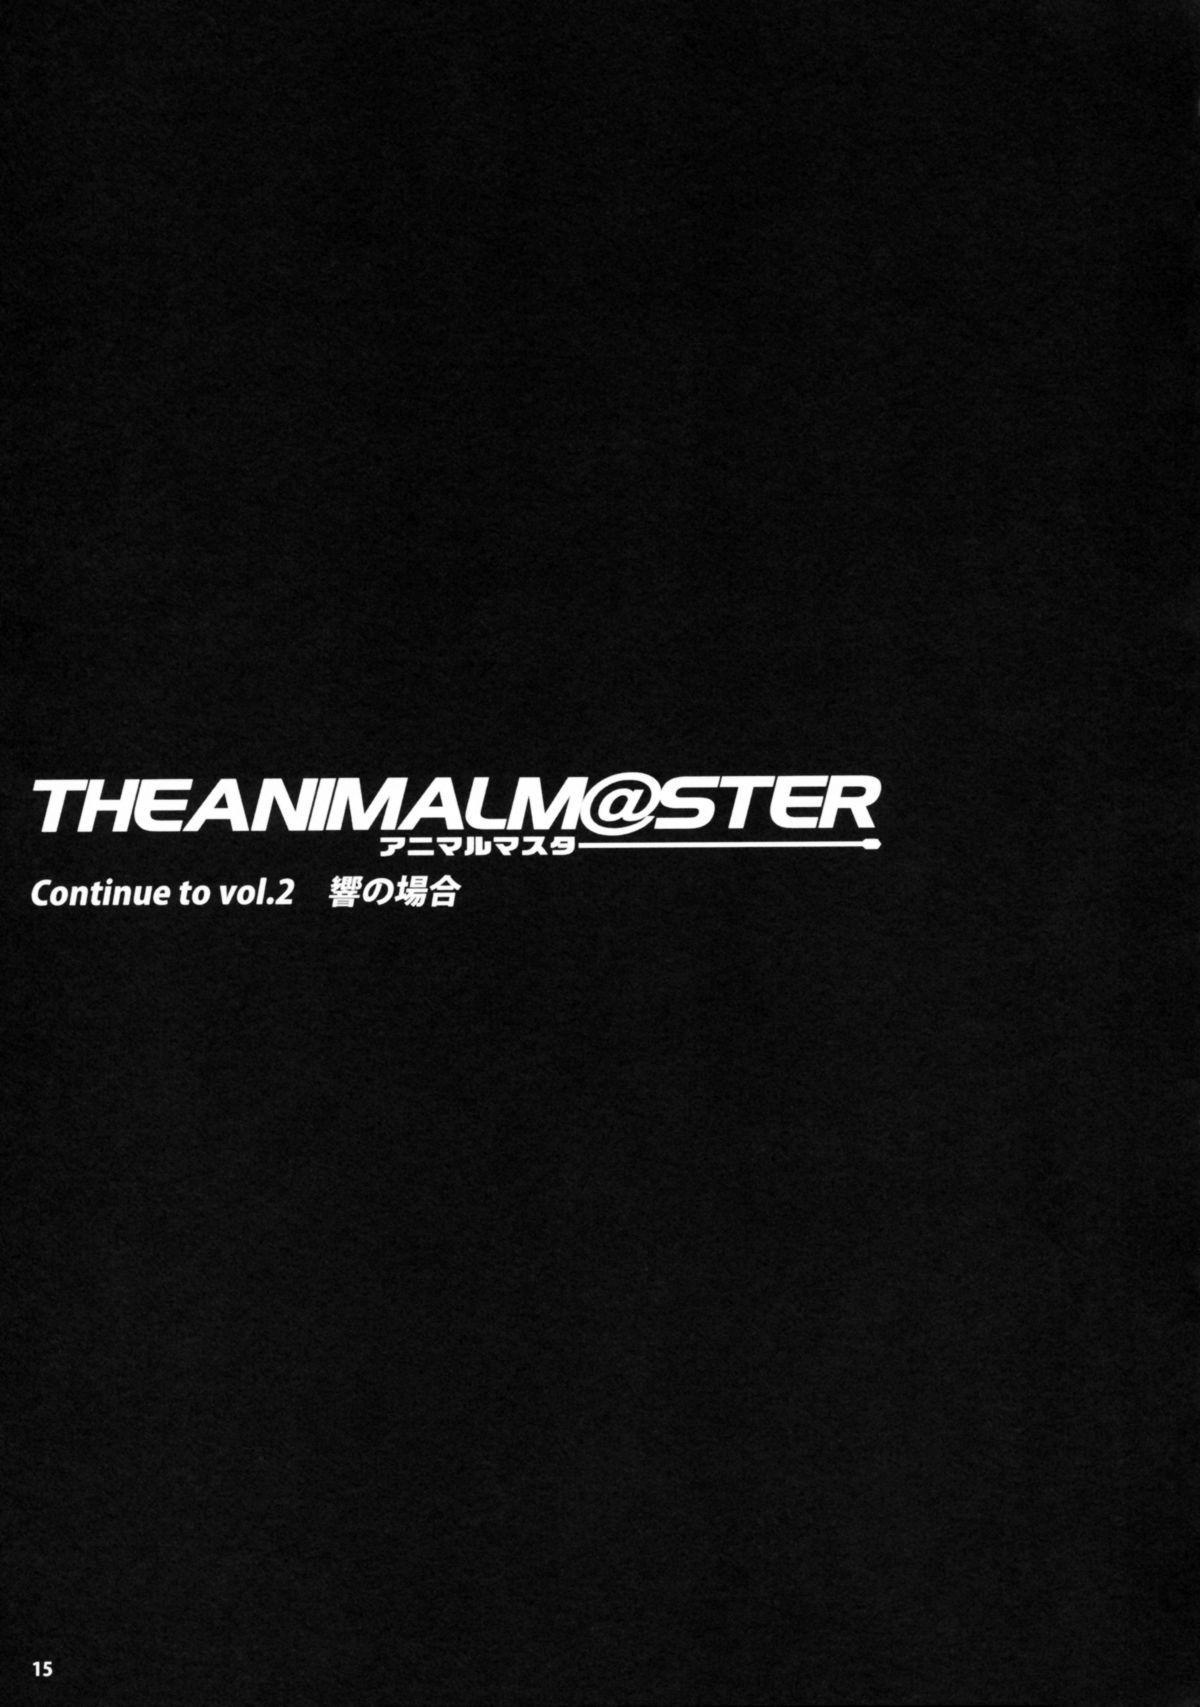 The Animalm@ster Vol. 1 15